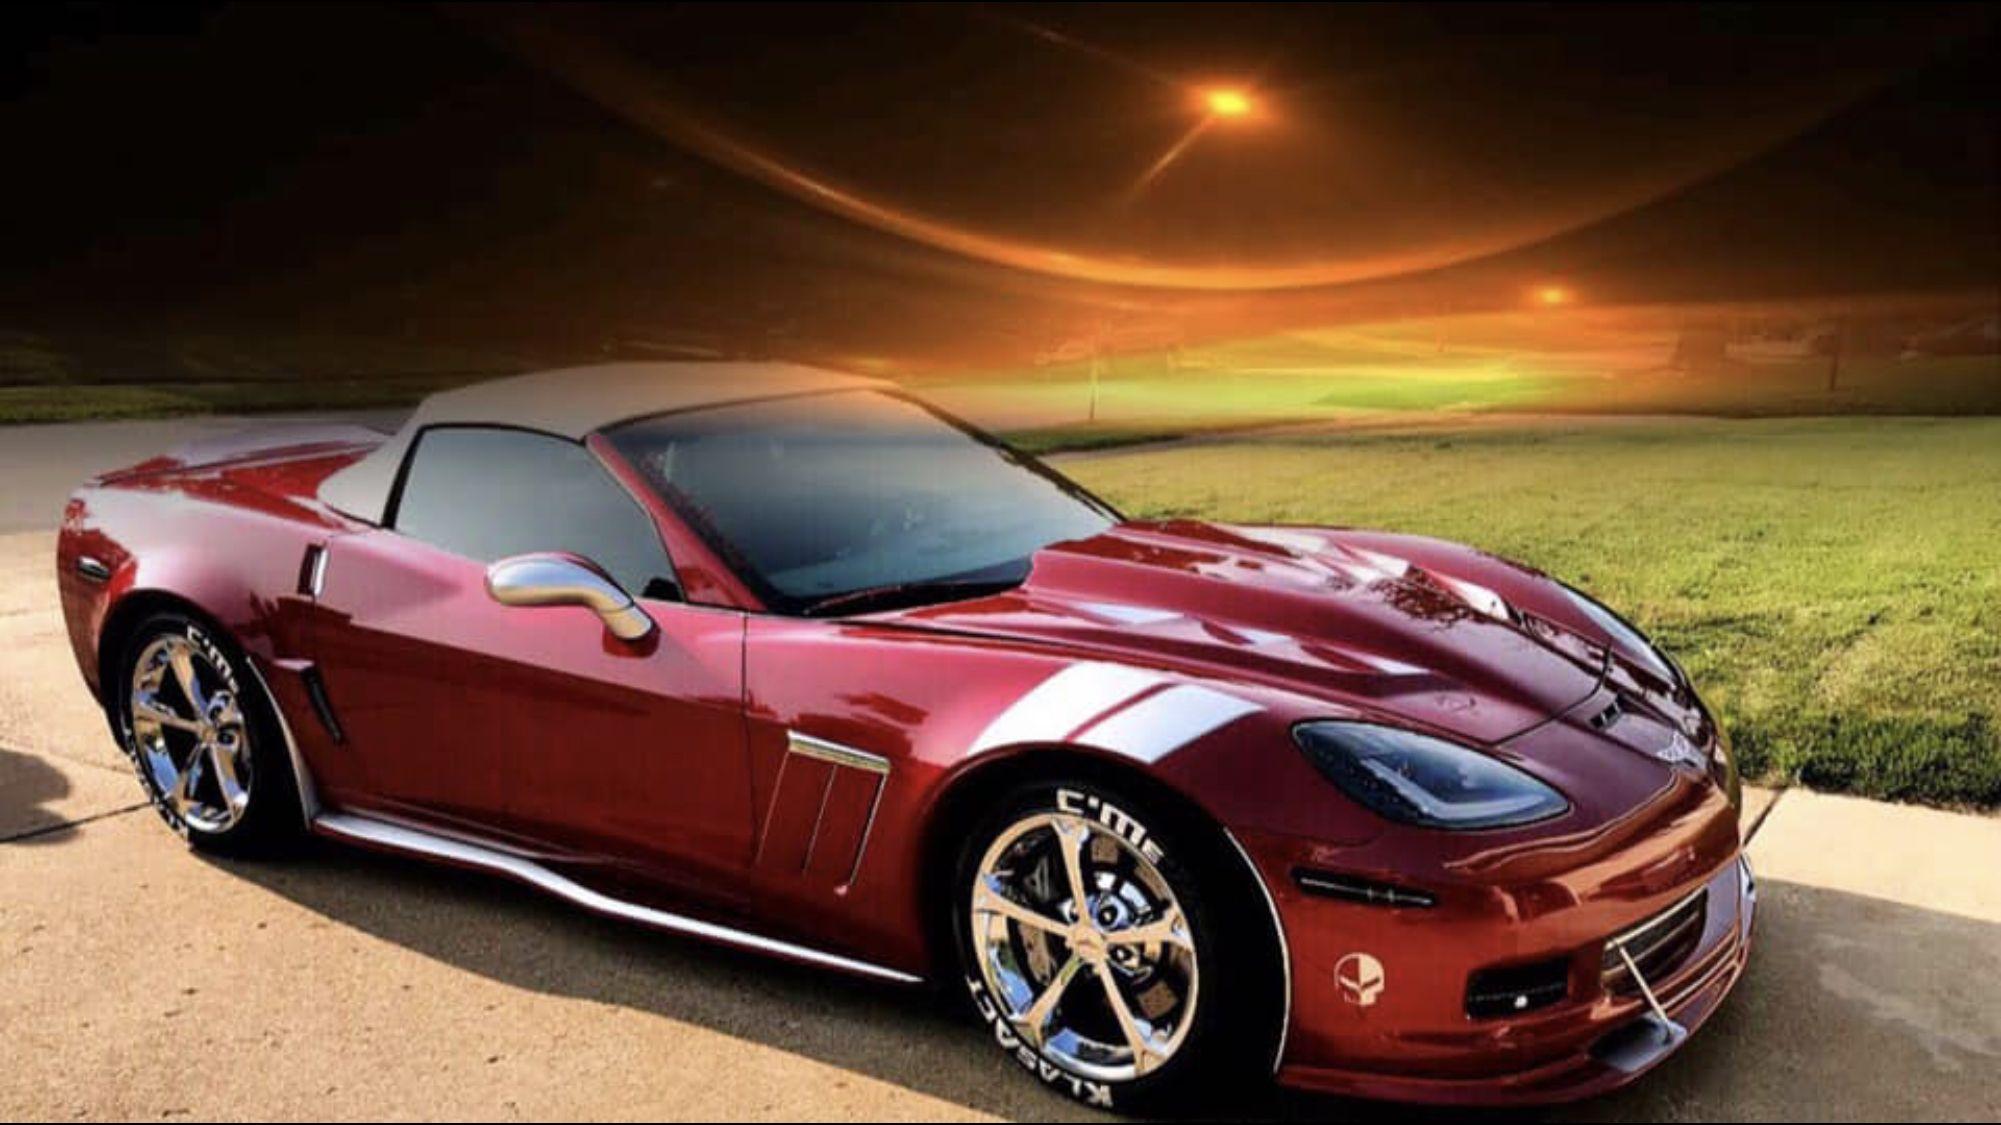 Pin by Mike Oaks on C7 Grand sport Corvette Corvette